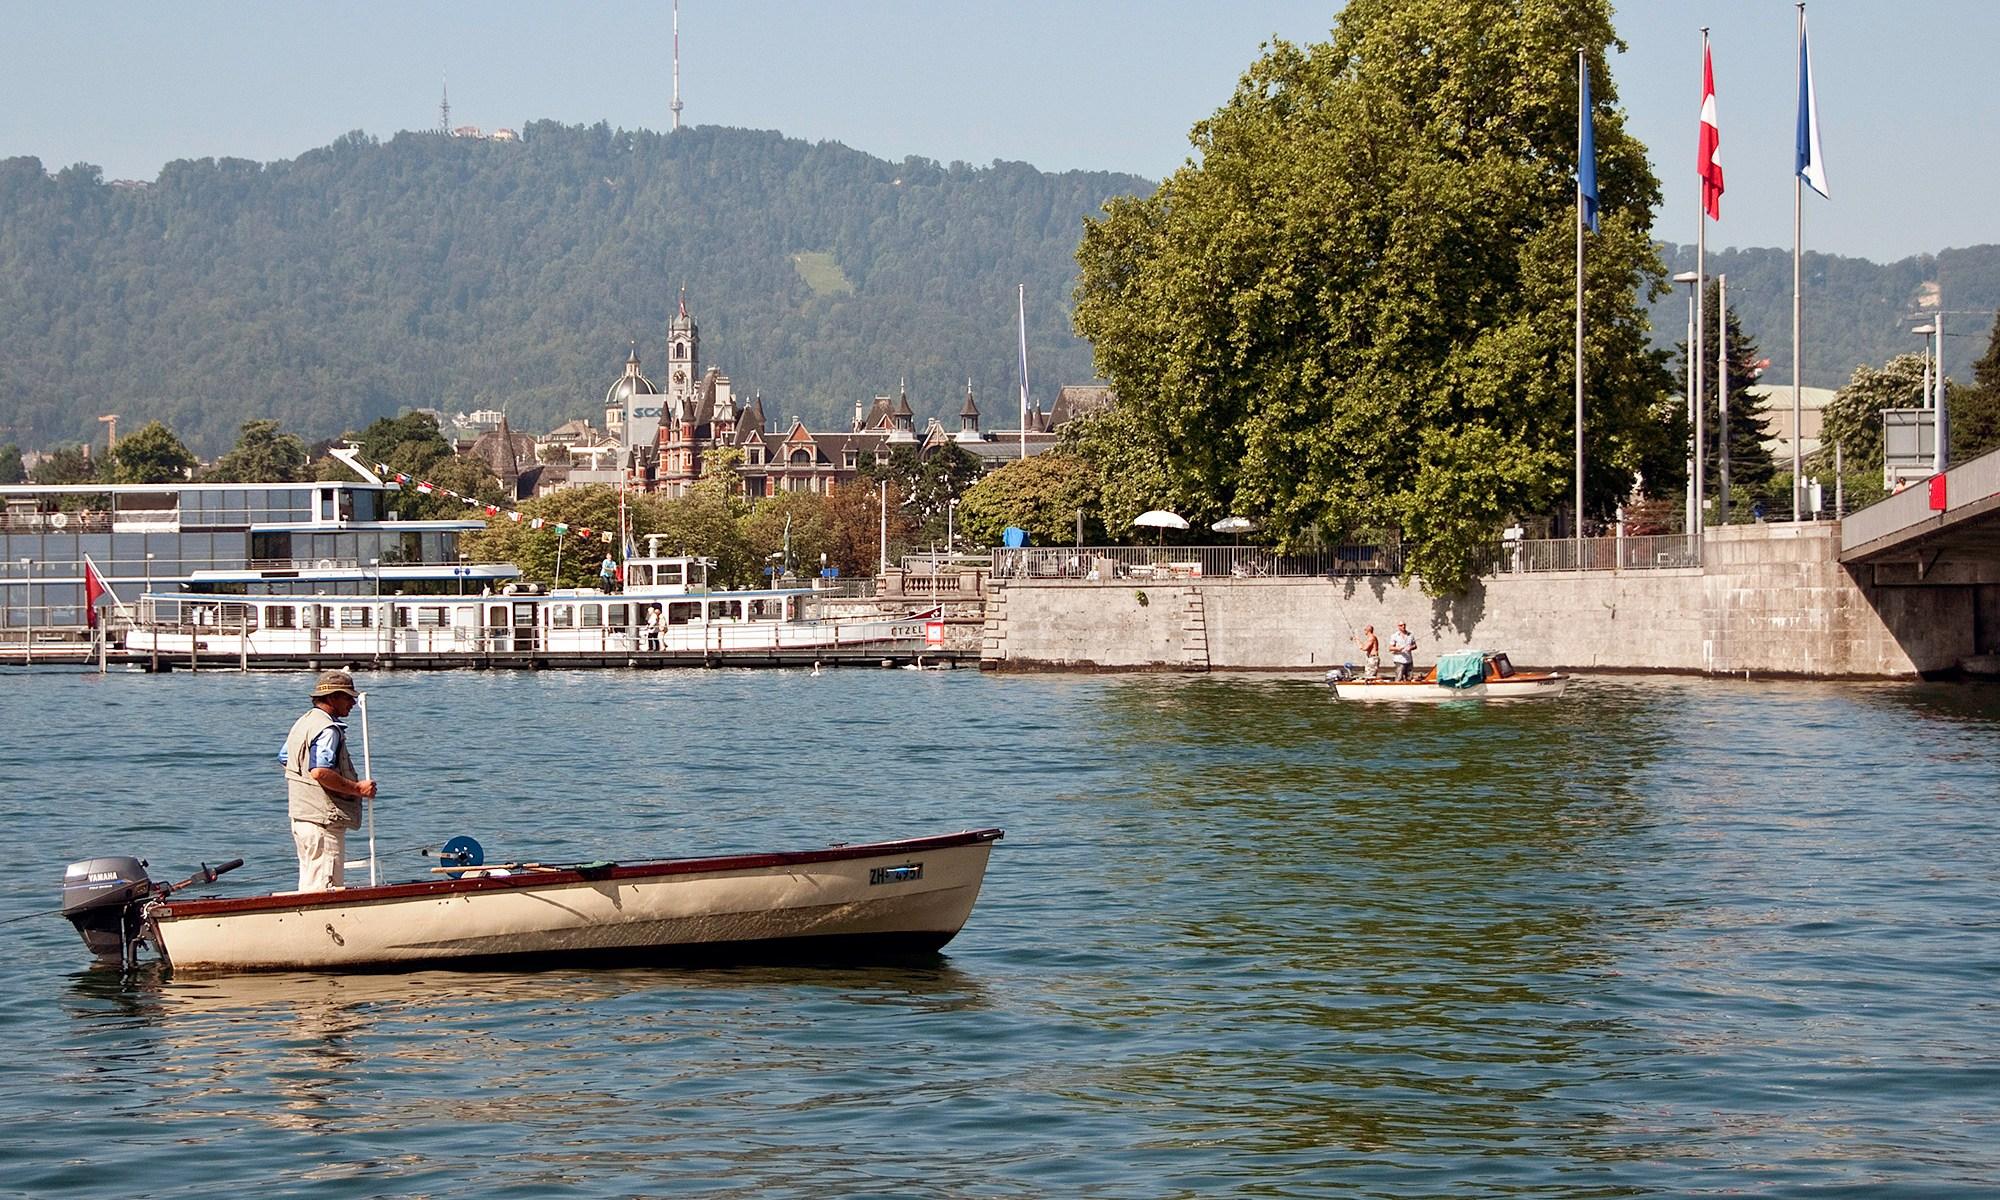 Fisherman on Lake Zurich